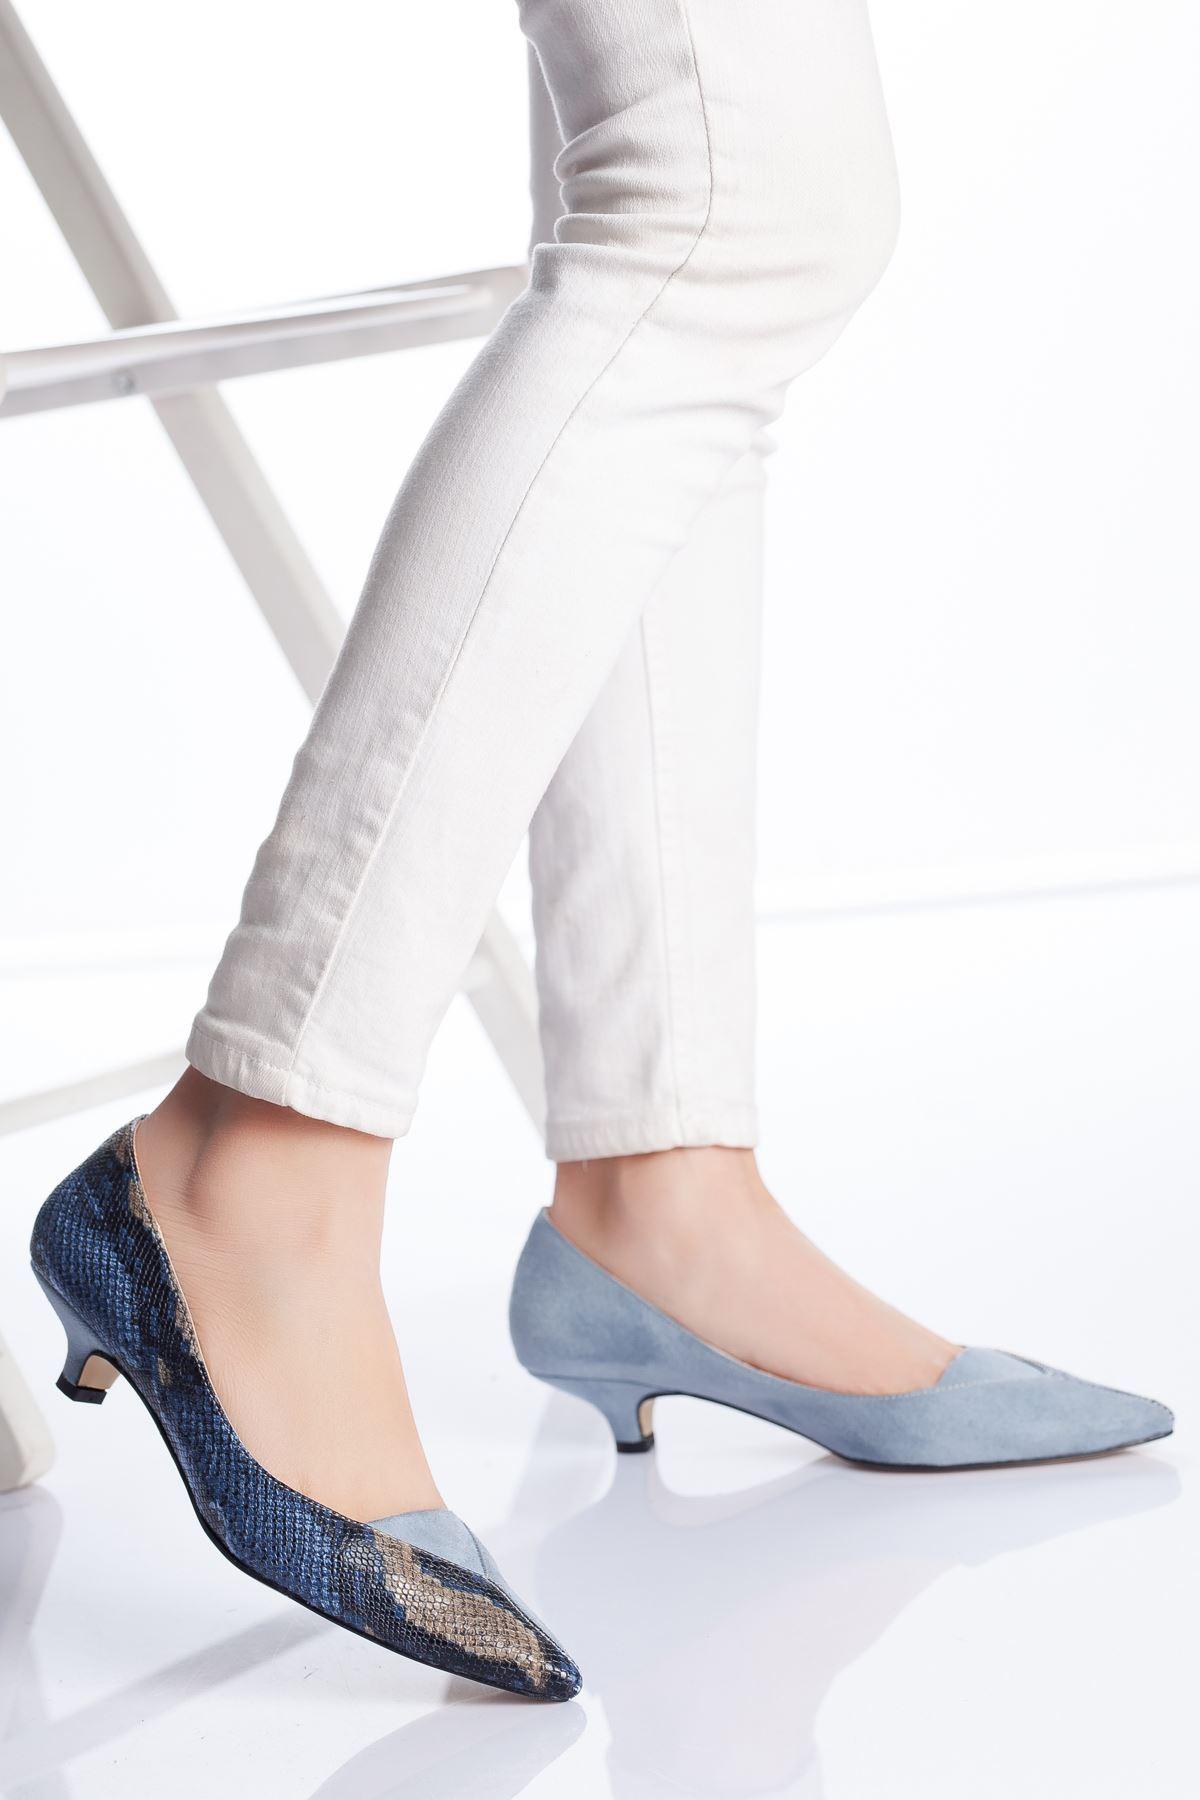 Odella Topuklu Ayakkabı MAVİ-YILAN